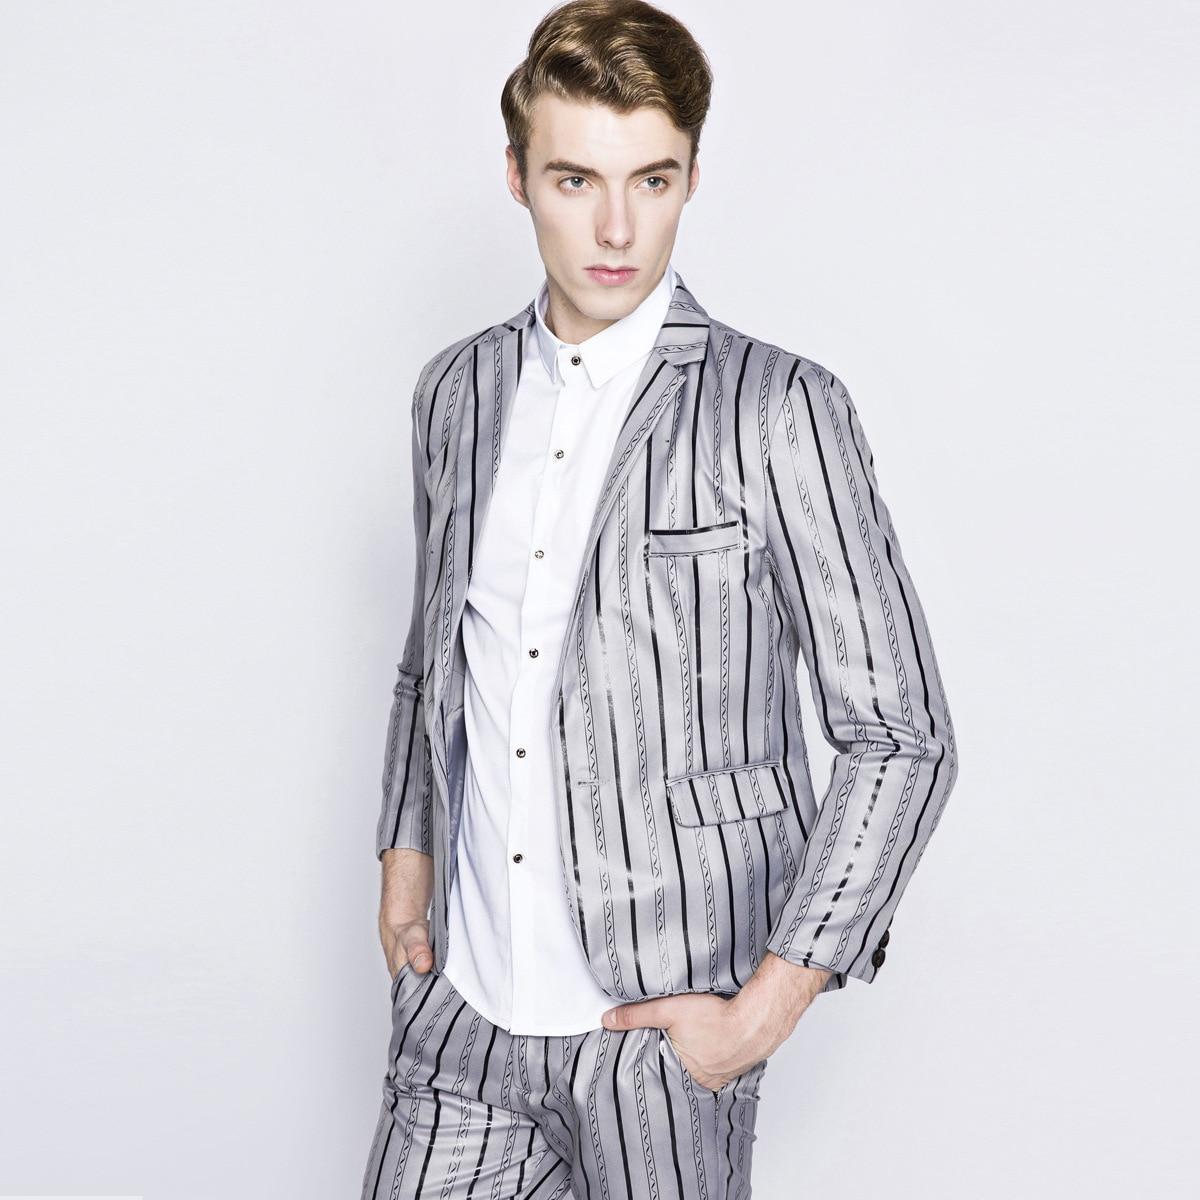 Mens striped suit latest coat pant designs men 39 s high end for High end men s dress shirts